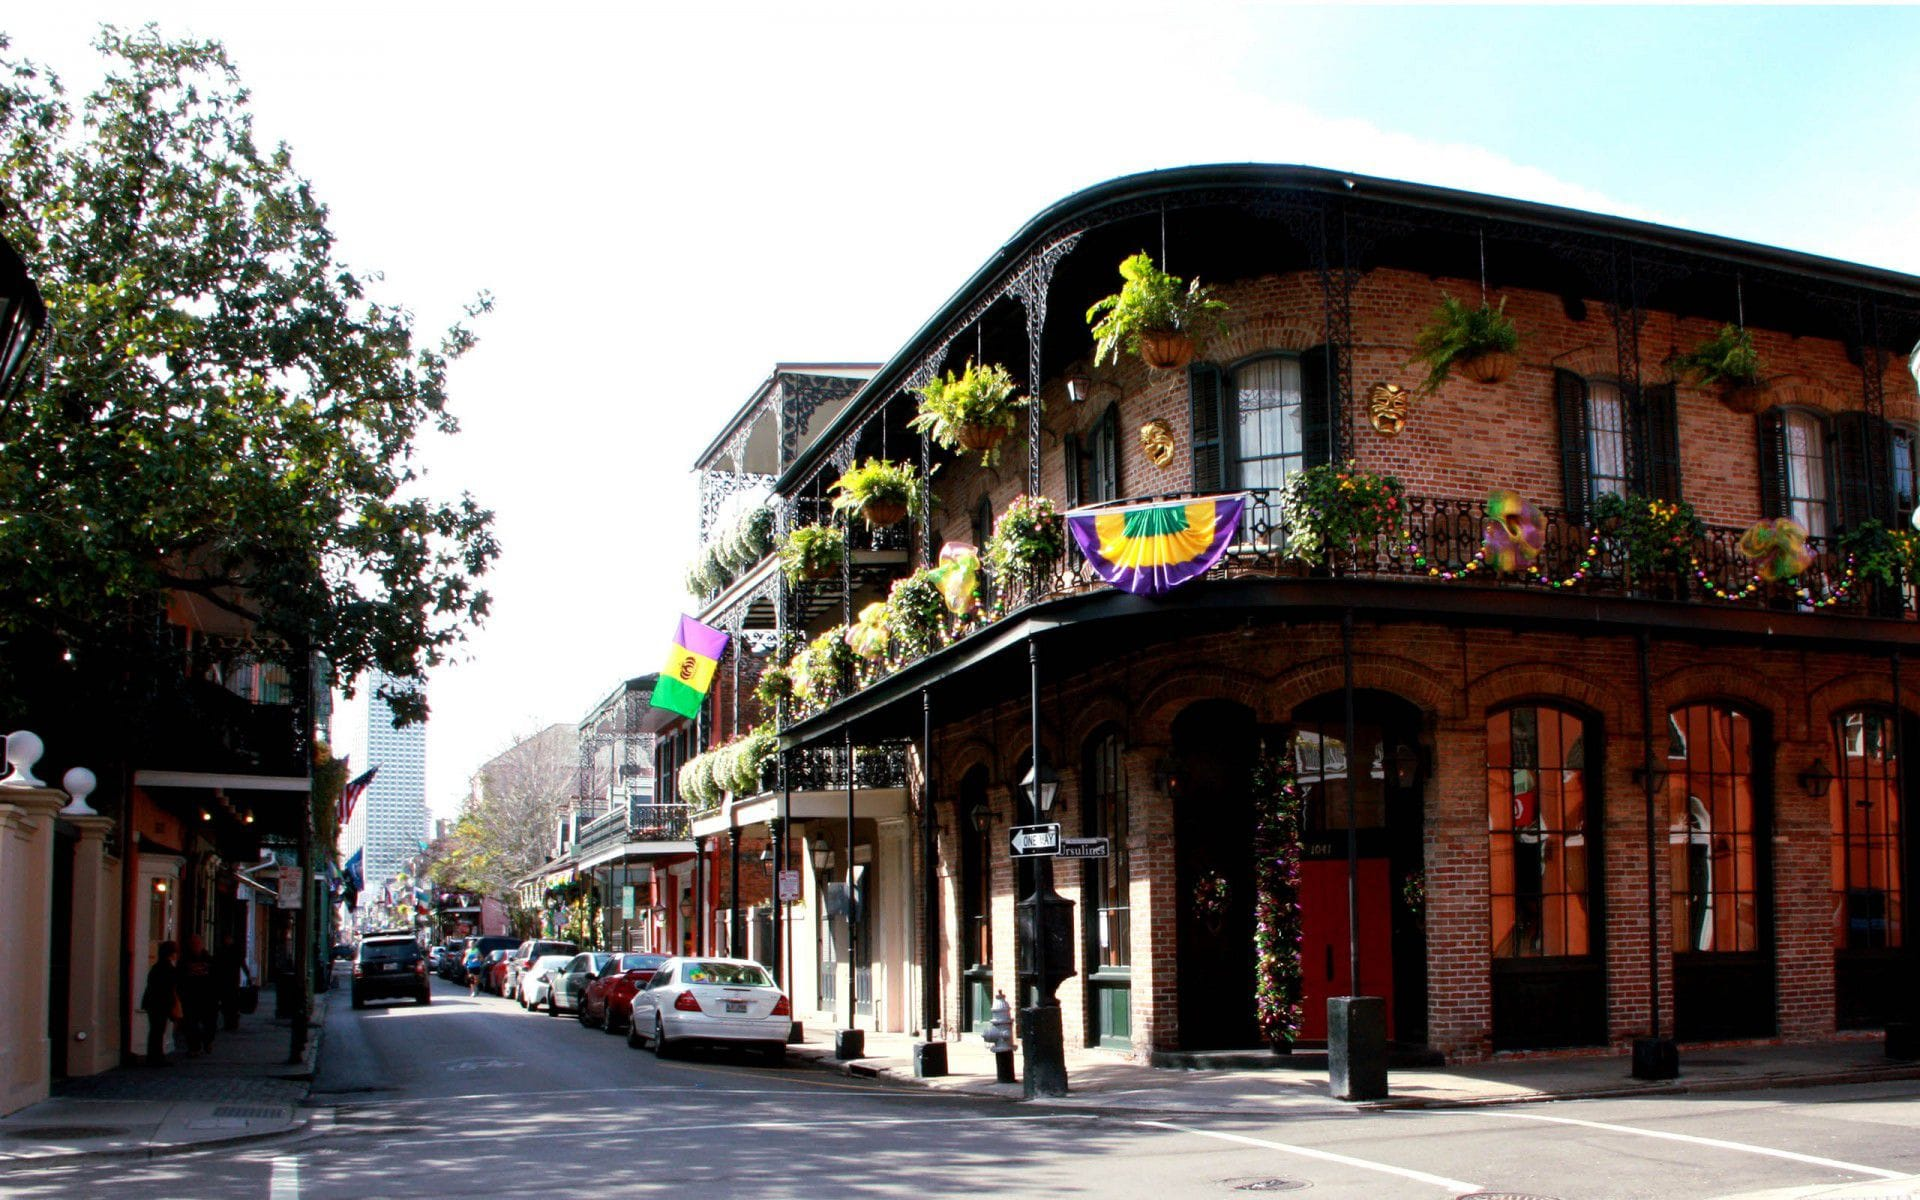 New Orleans Hd Wallpapers 7wallpapersnet